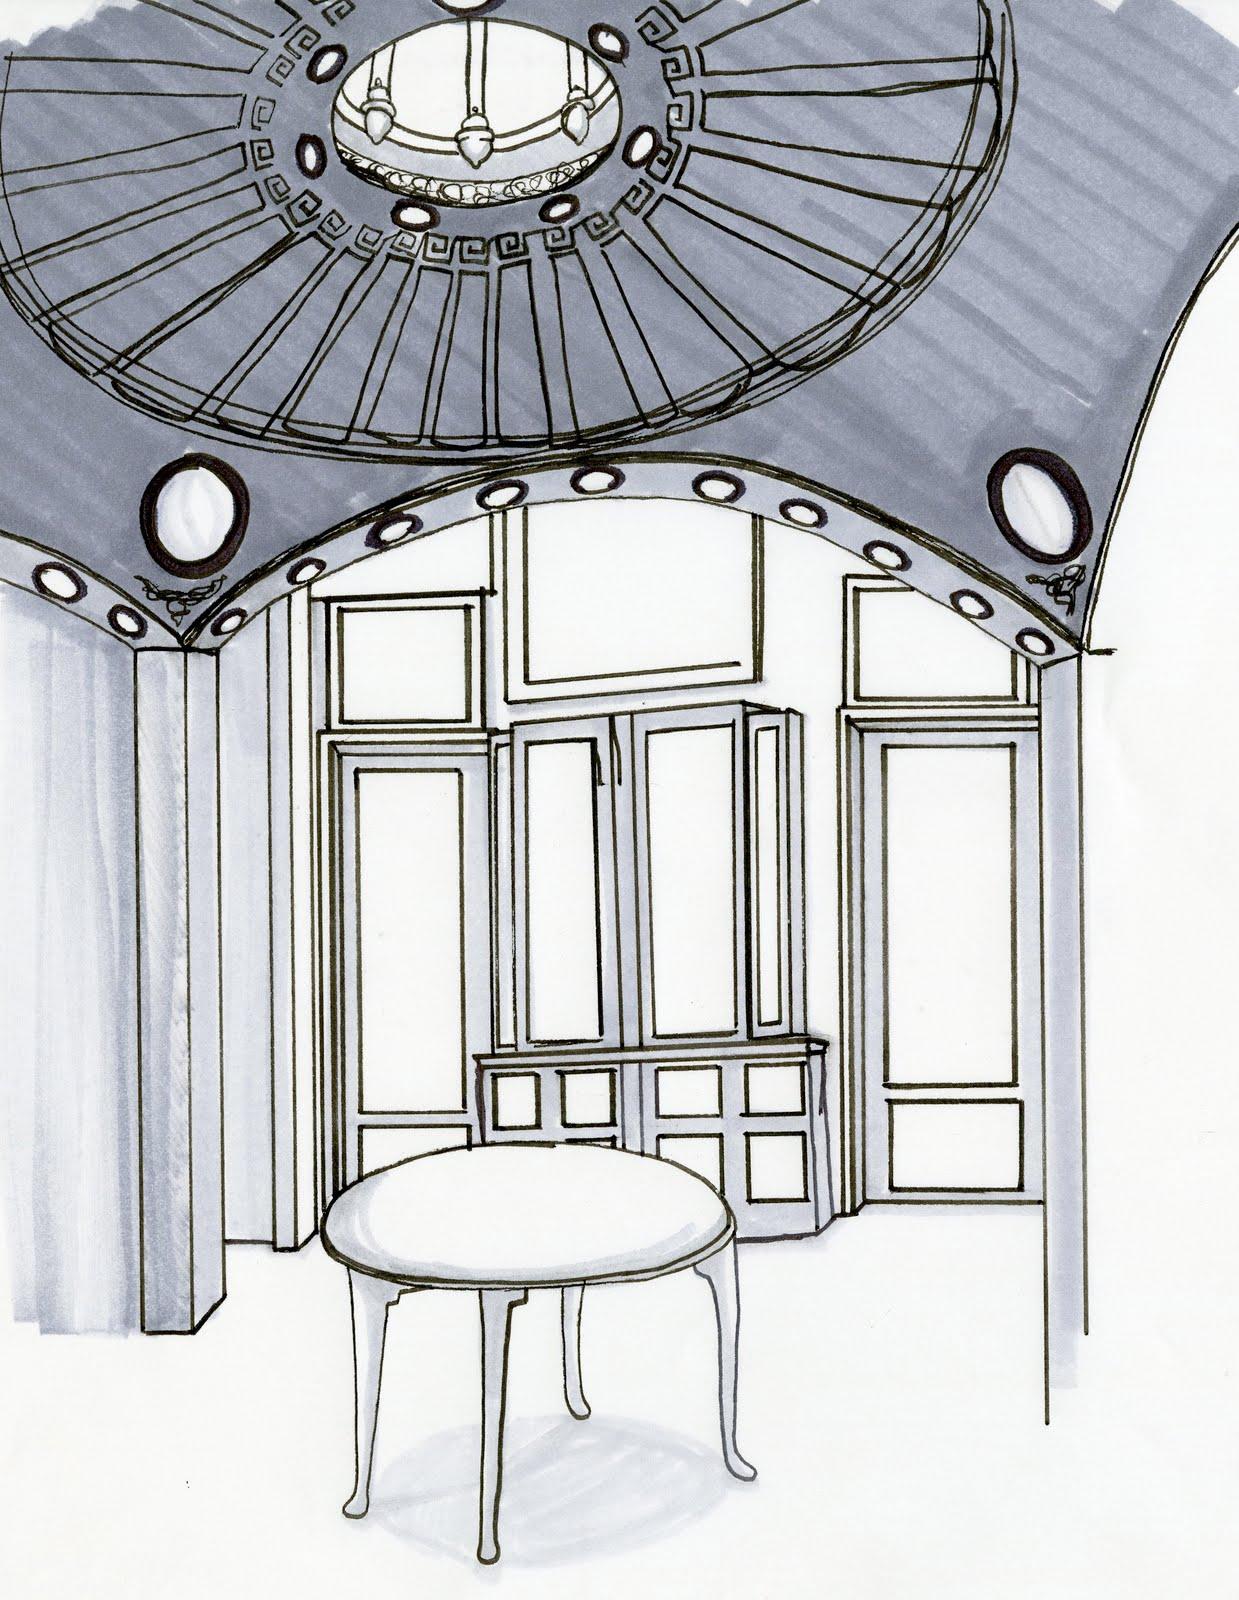 Rebecca U0026 39 S Third Year Blog Folio  Sir John Soane House Drawings